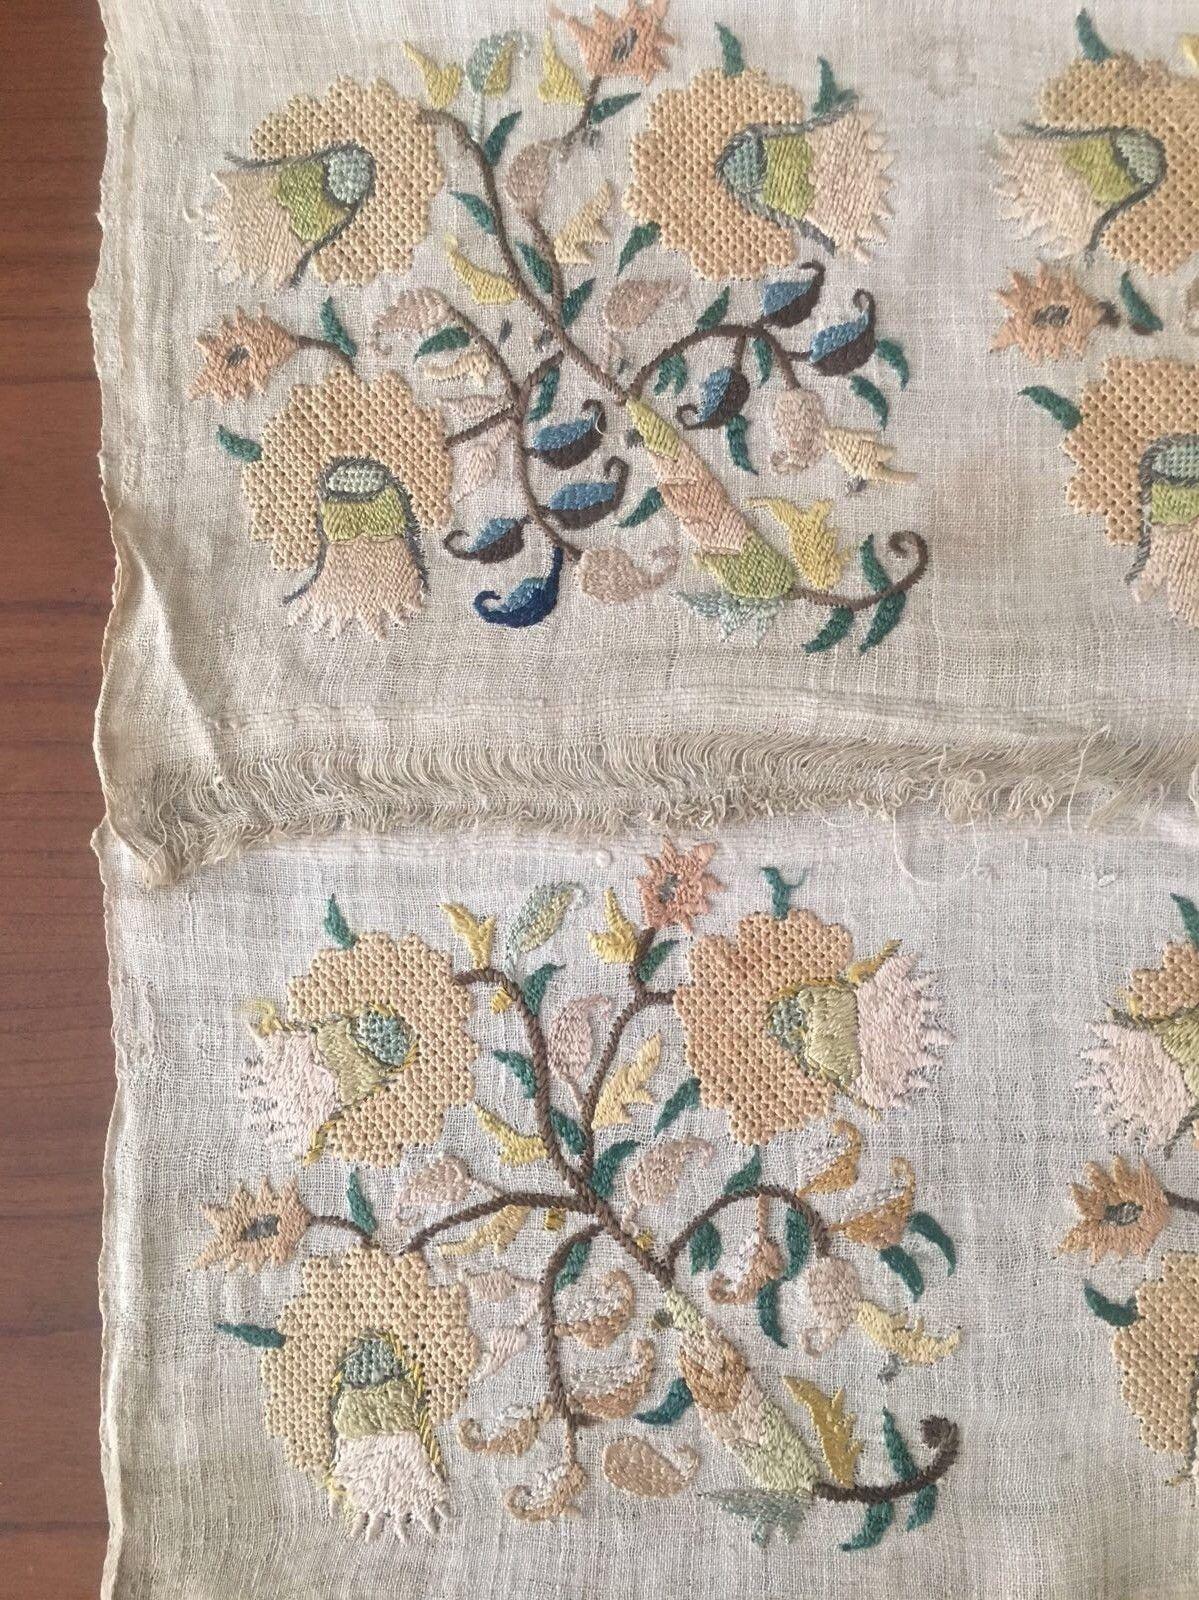 19th Antique Ottoman Turkish Silk Hand Embroidery On Linen